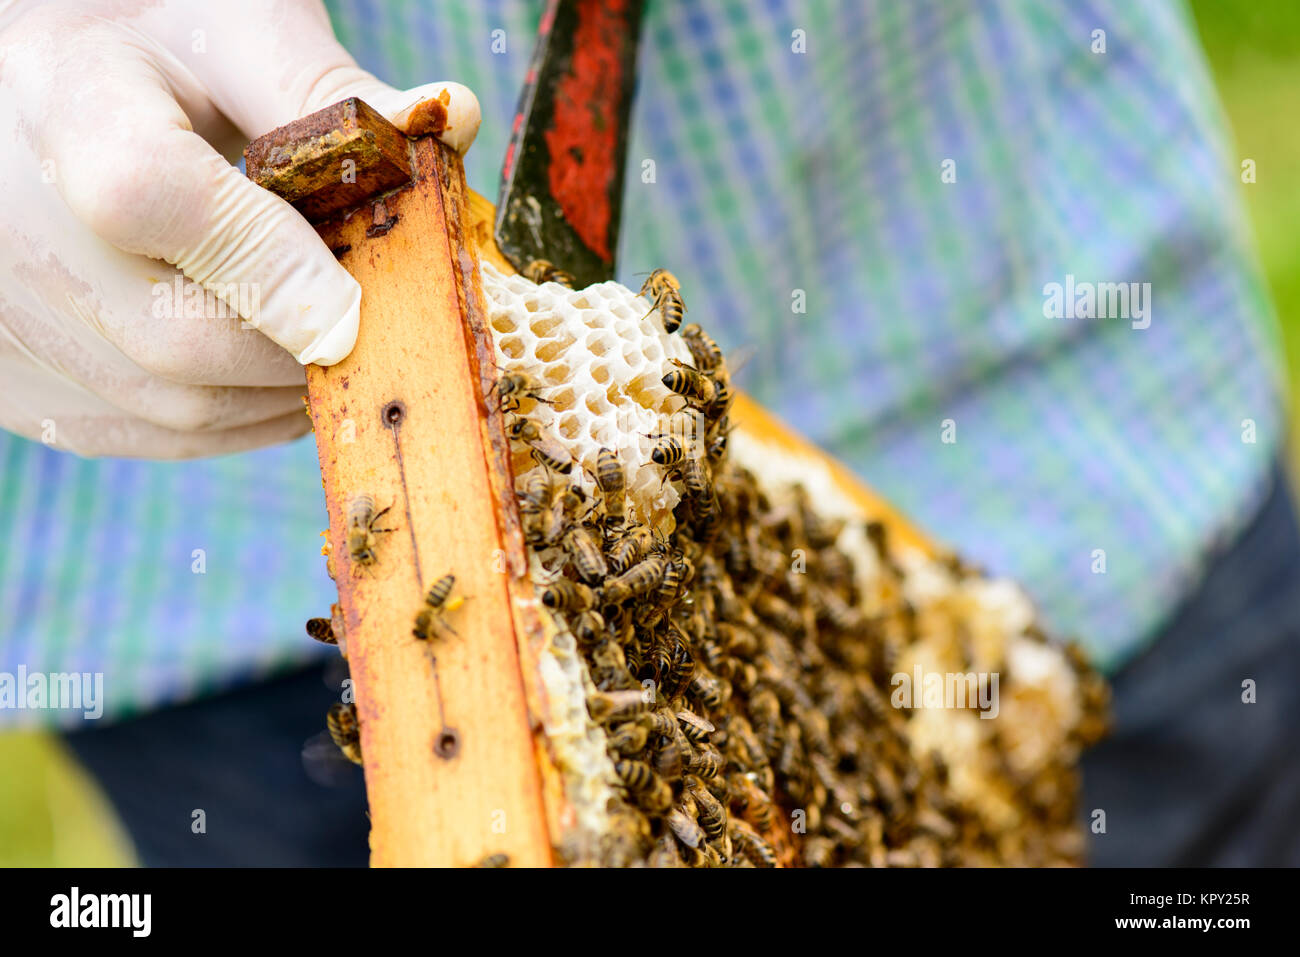 honigwaben waben bienenwachs wachs bienenstock stockfotos honigwaben waben bienenwachs wachs. Black Bedroom Furniture Sets. Home Design Ideas